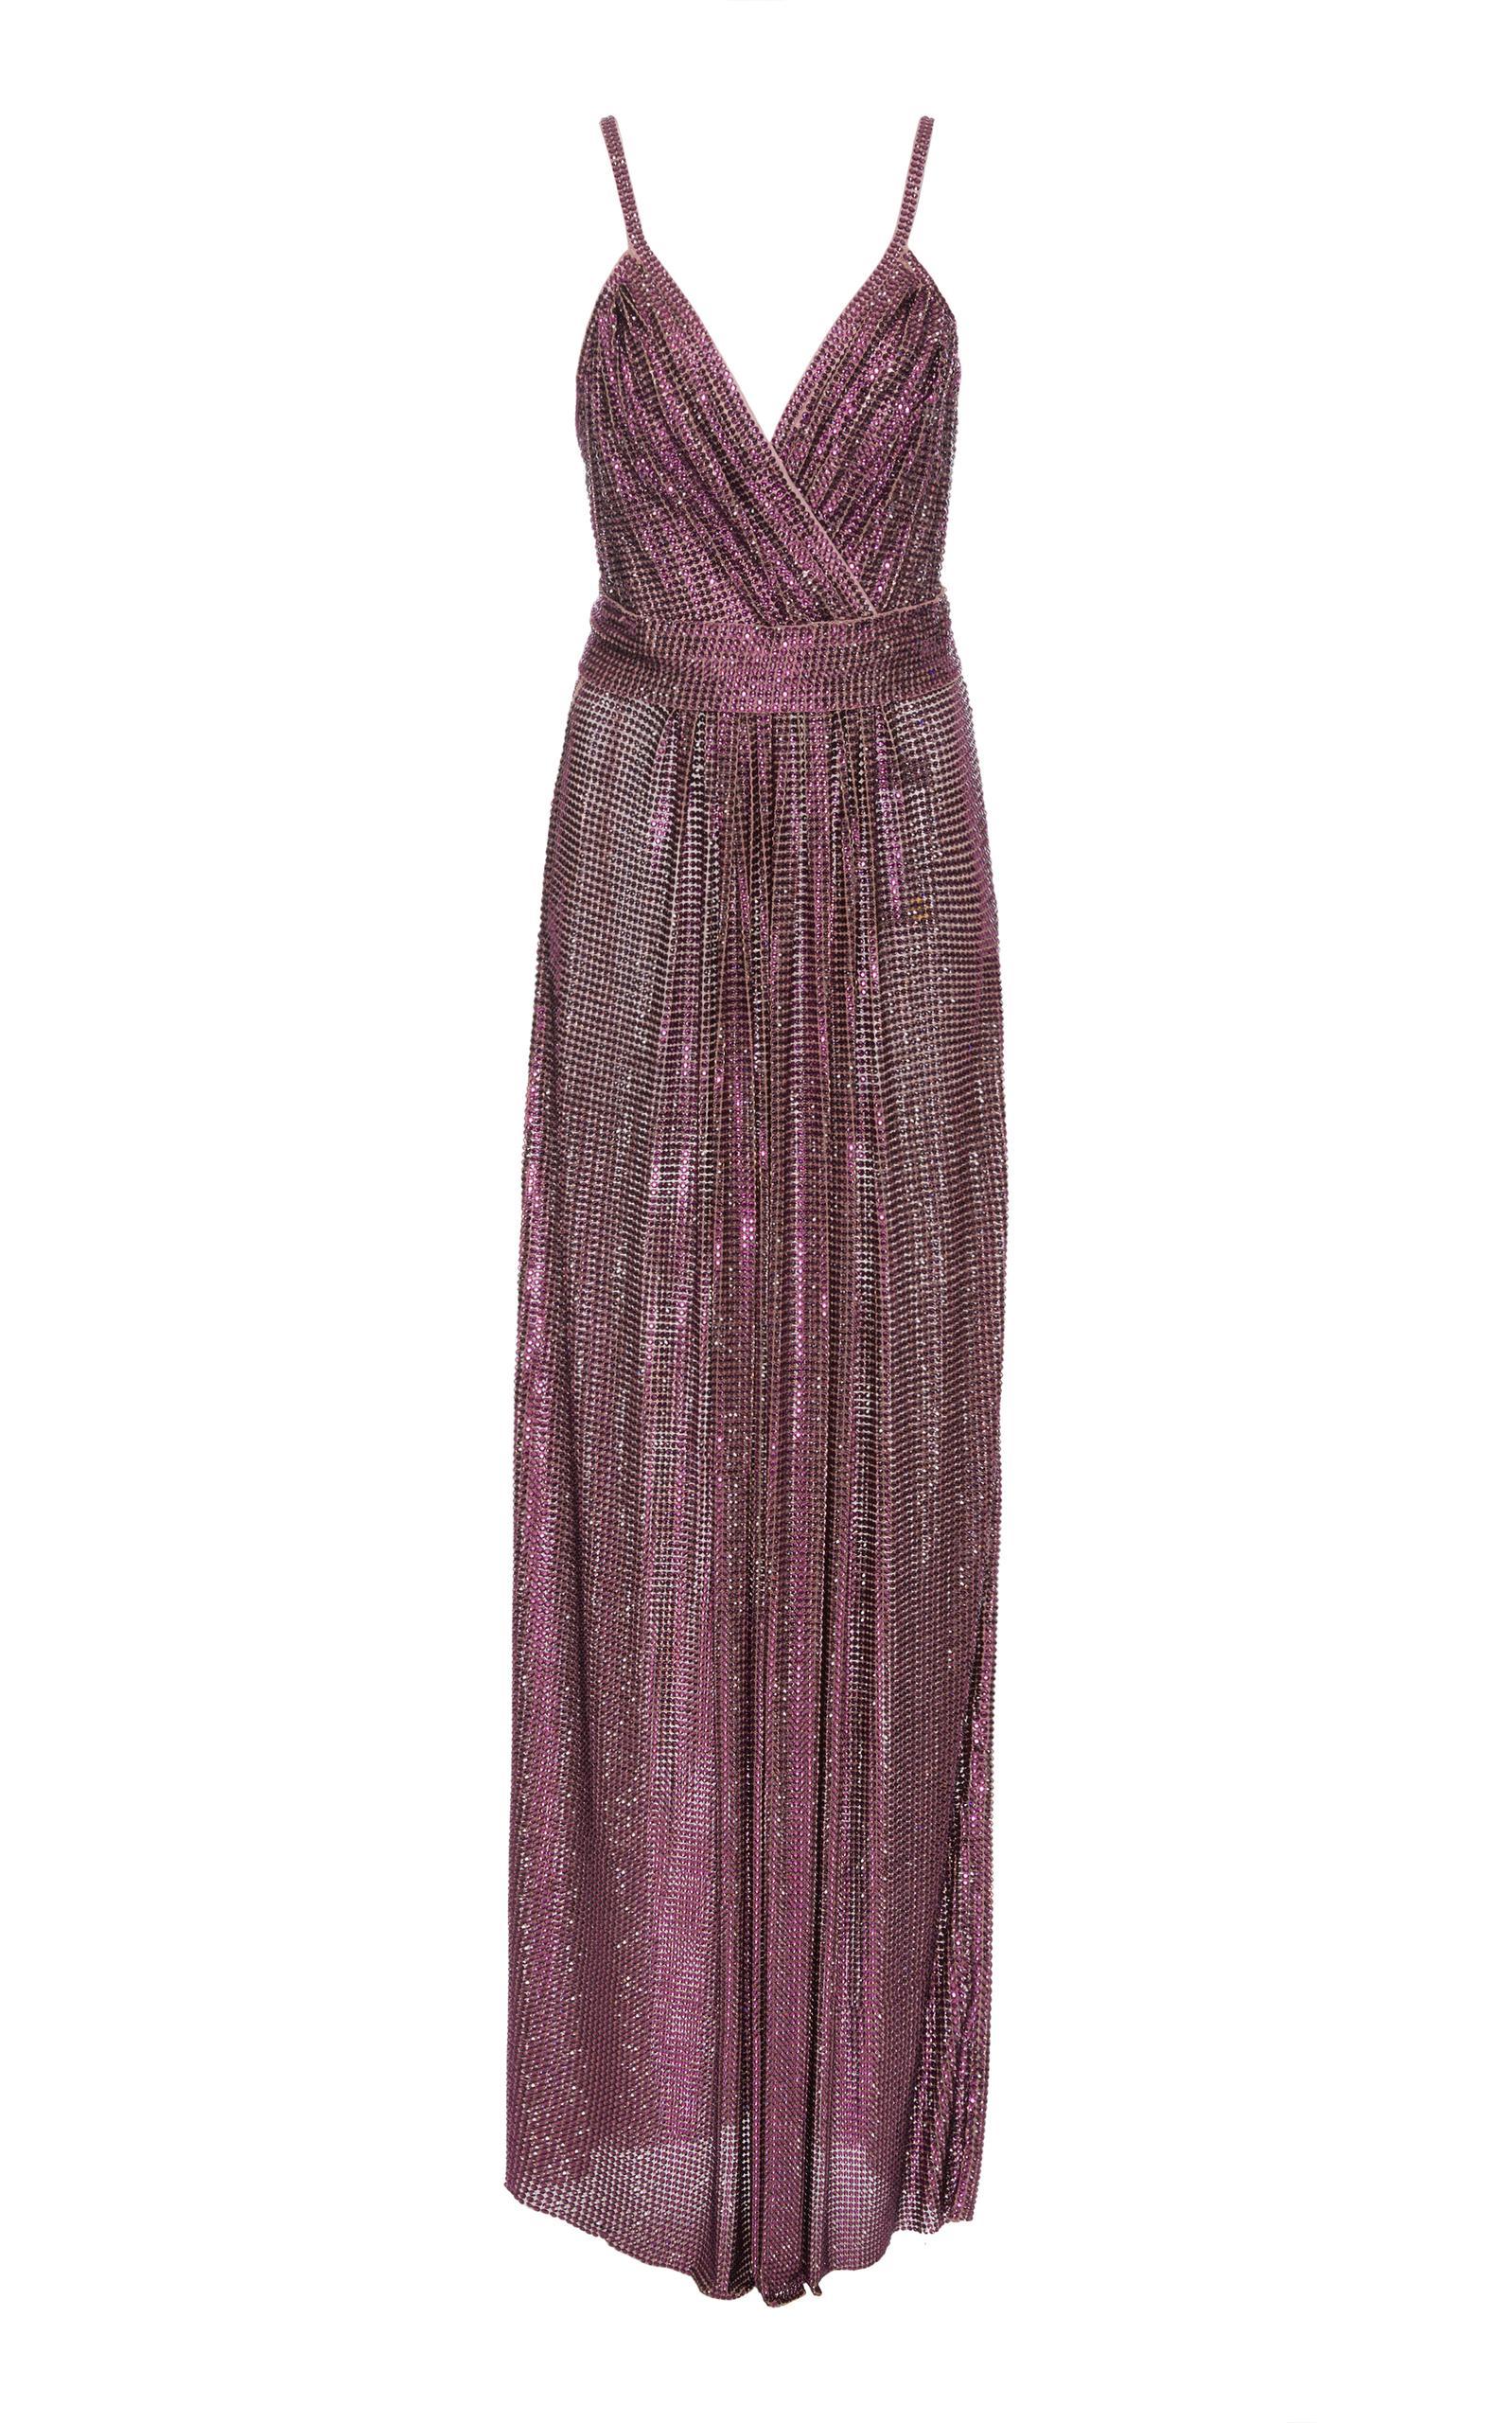 Dolce & Gabbana Sequin Wrap Gown In Purple